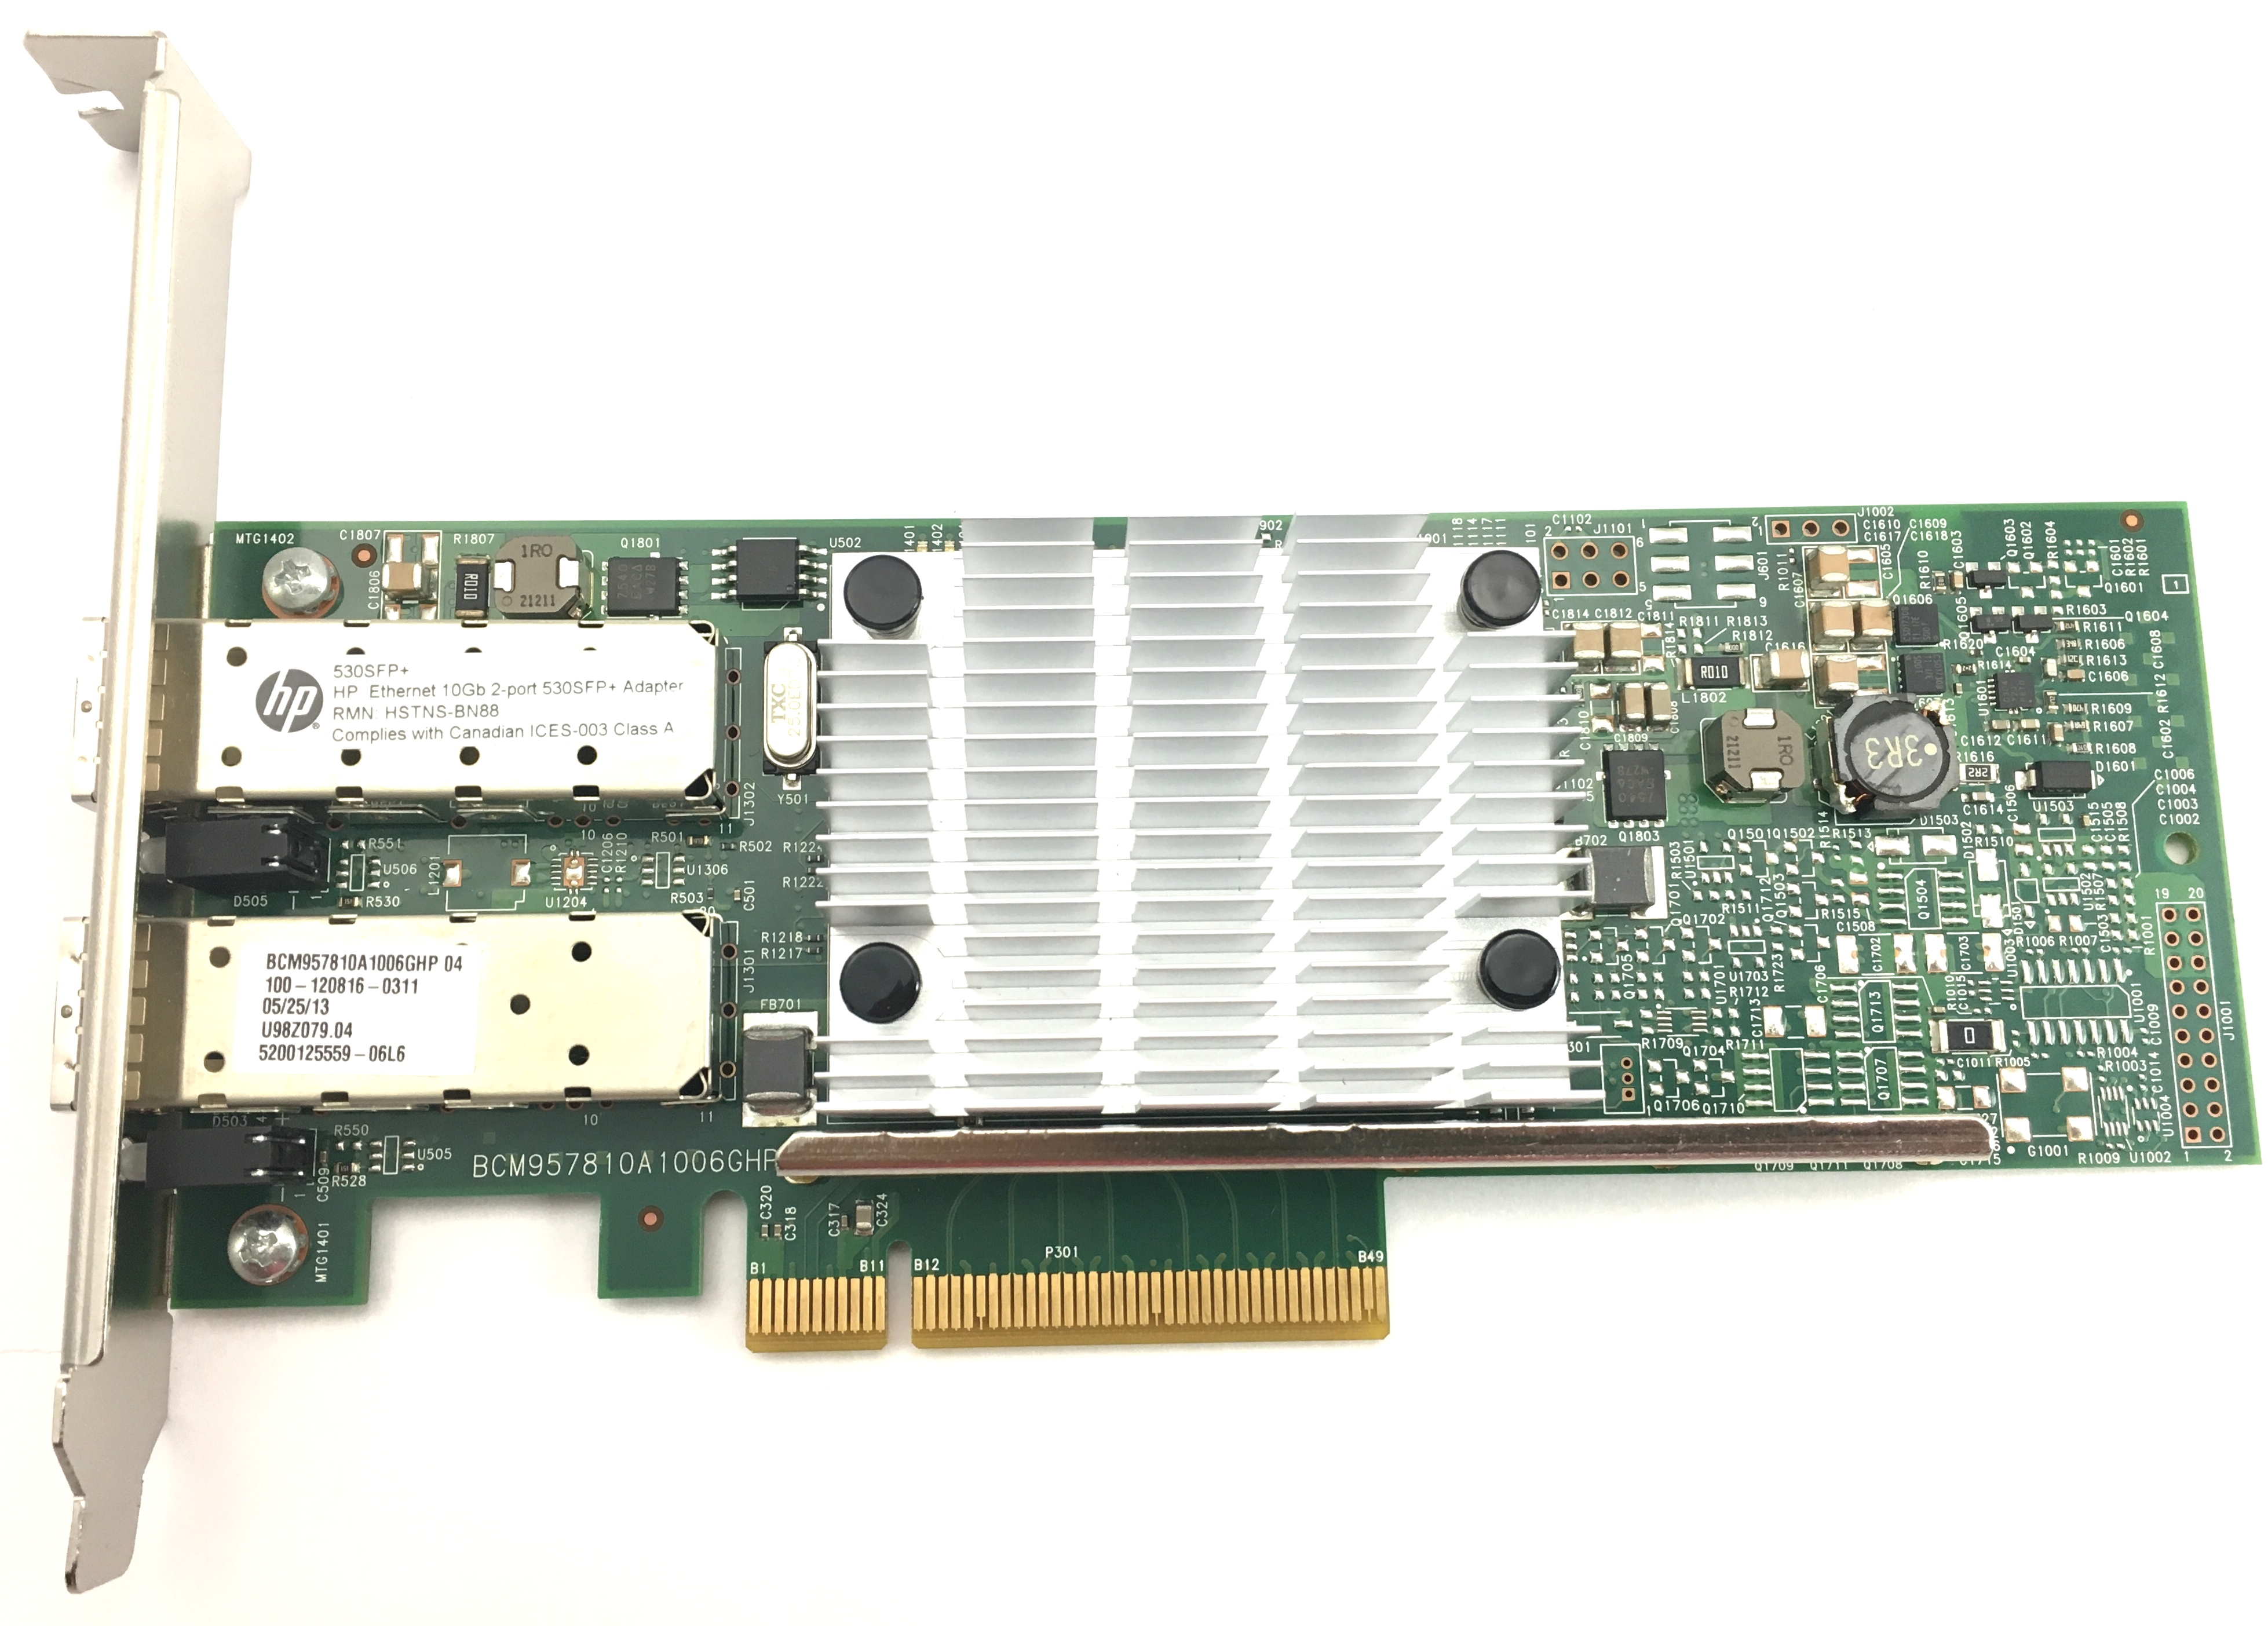 PCIe 2-Port NIC 656244-001 HP 530SFP 10Gb Ethernet 10GbE SFP